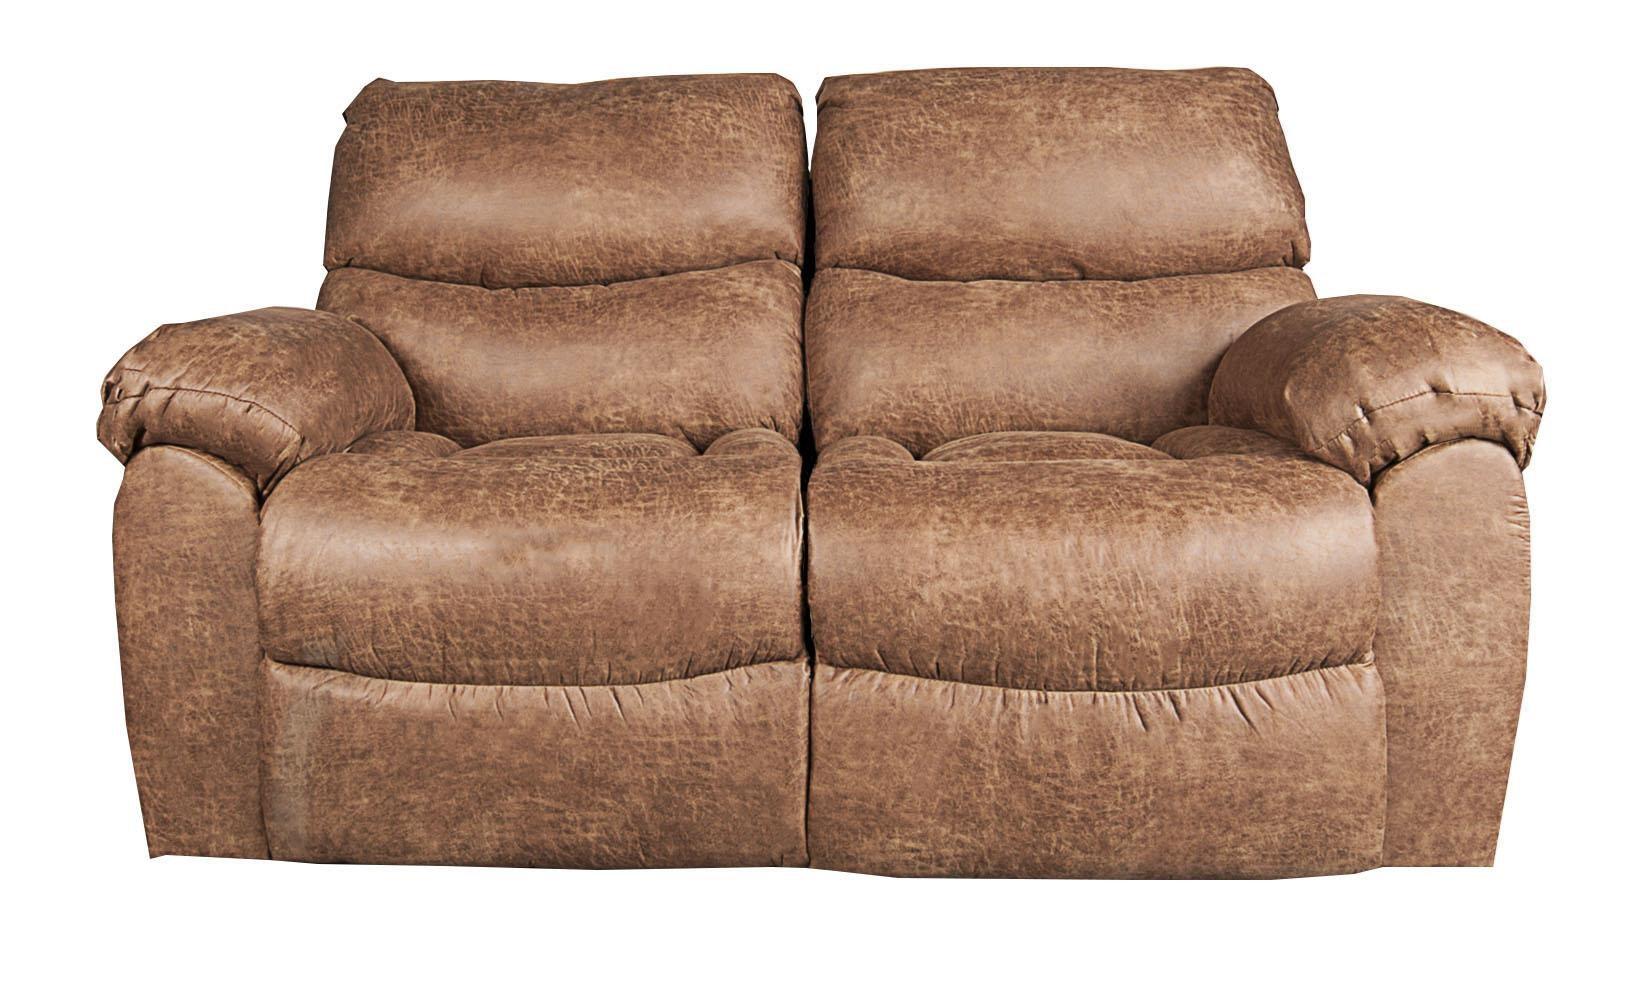 Morris Home Furnishings Mitchem Mitchem Rocking Reclining Loveseat - Item Number: 219341562